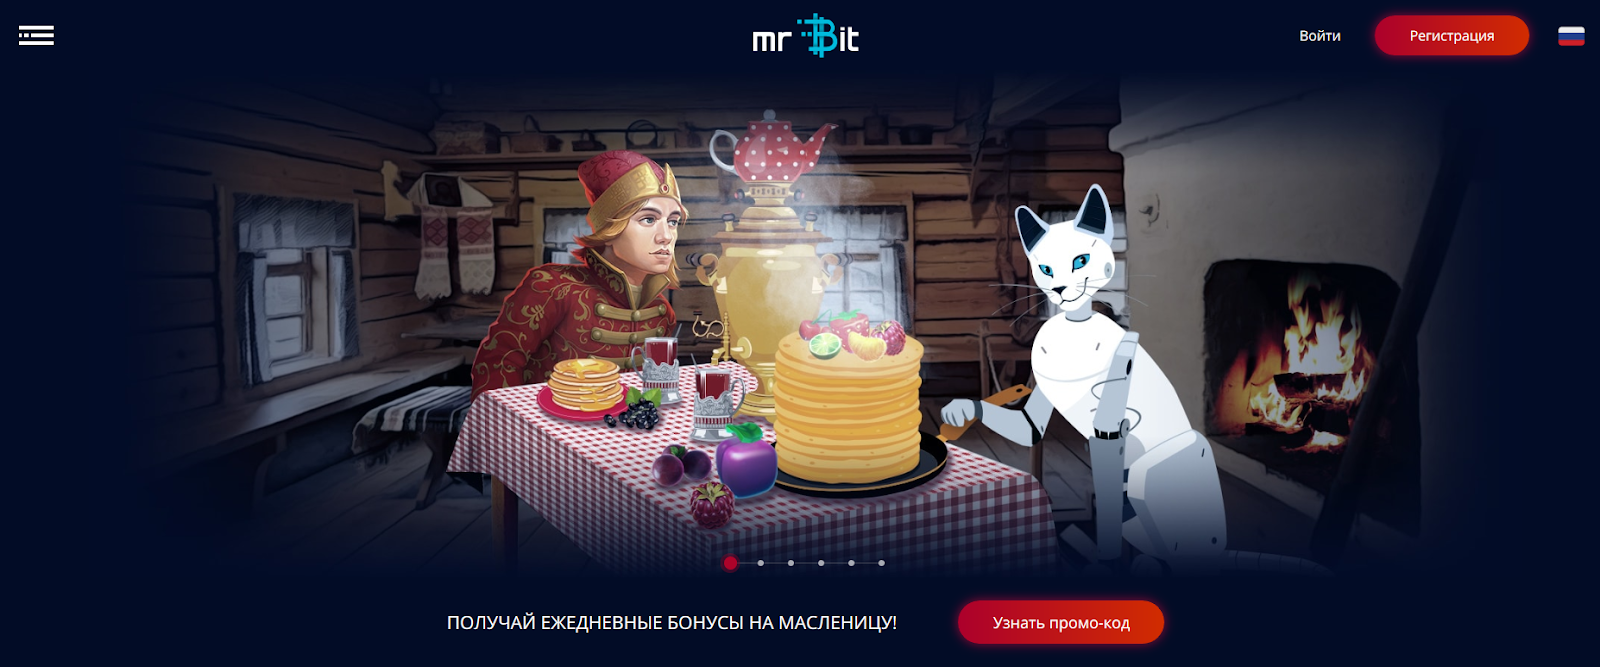 Mr Bit Официальный сайт